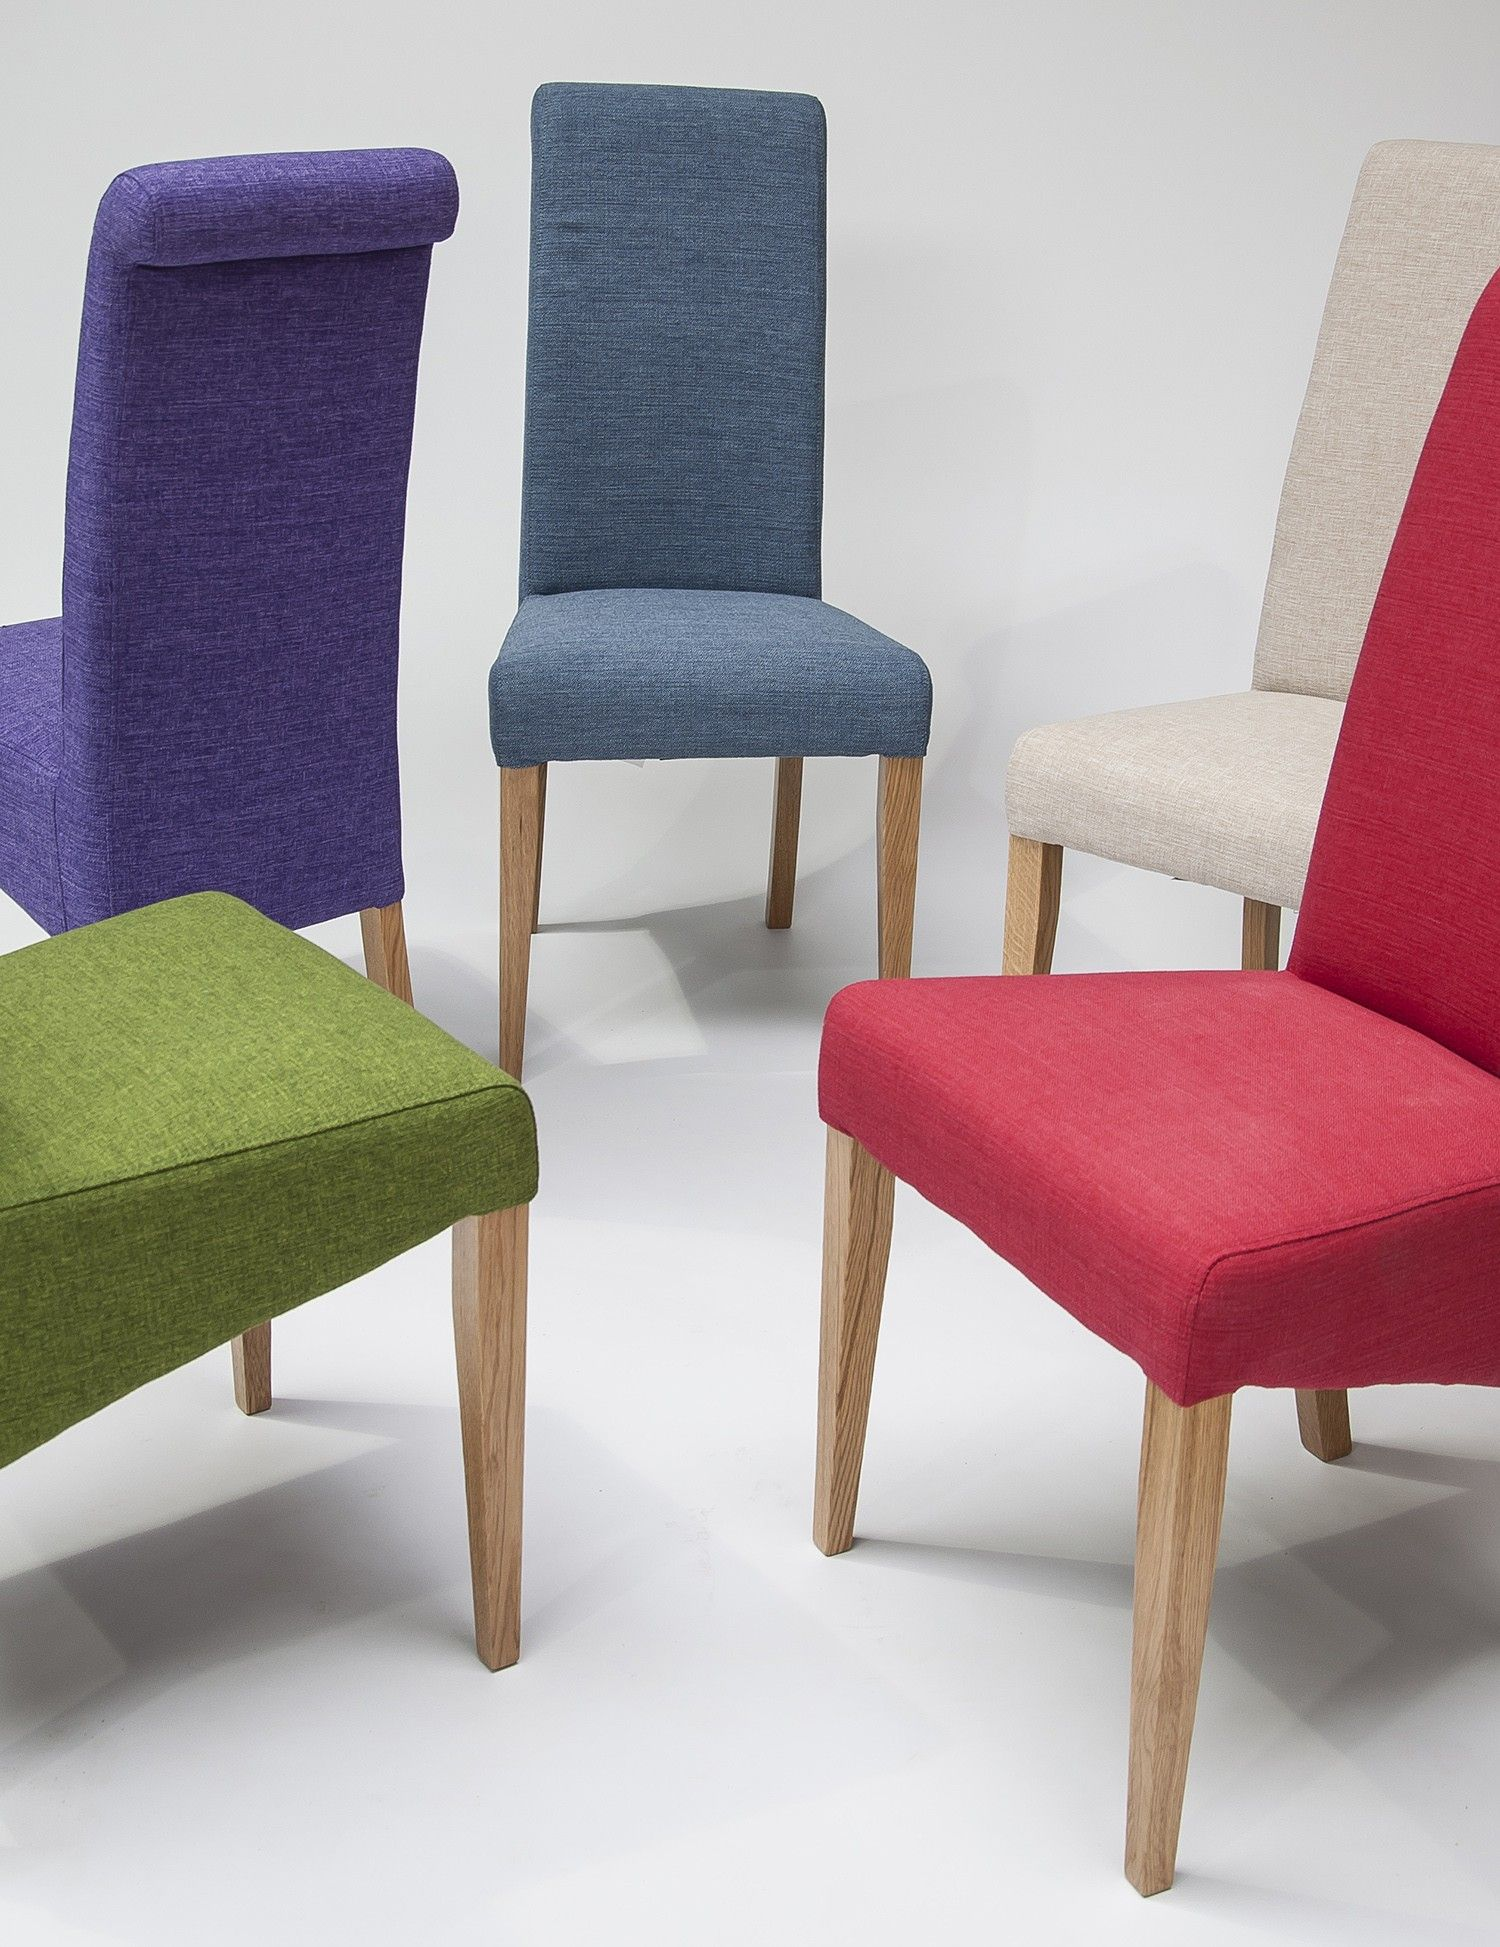 Tivoli Oak Fabric Rollback Chair Teal Pair Dining Chairs